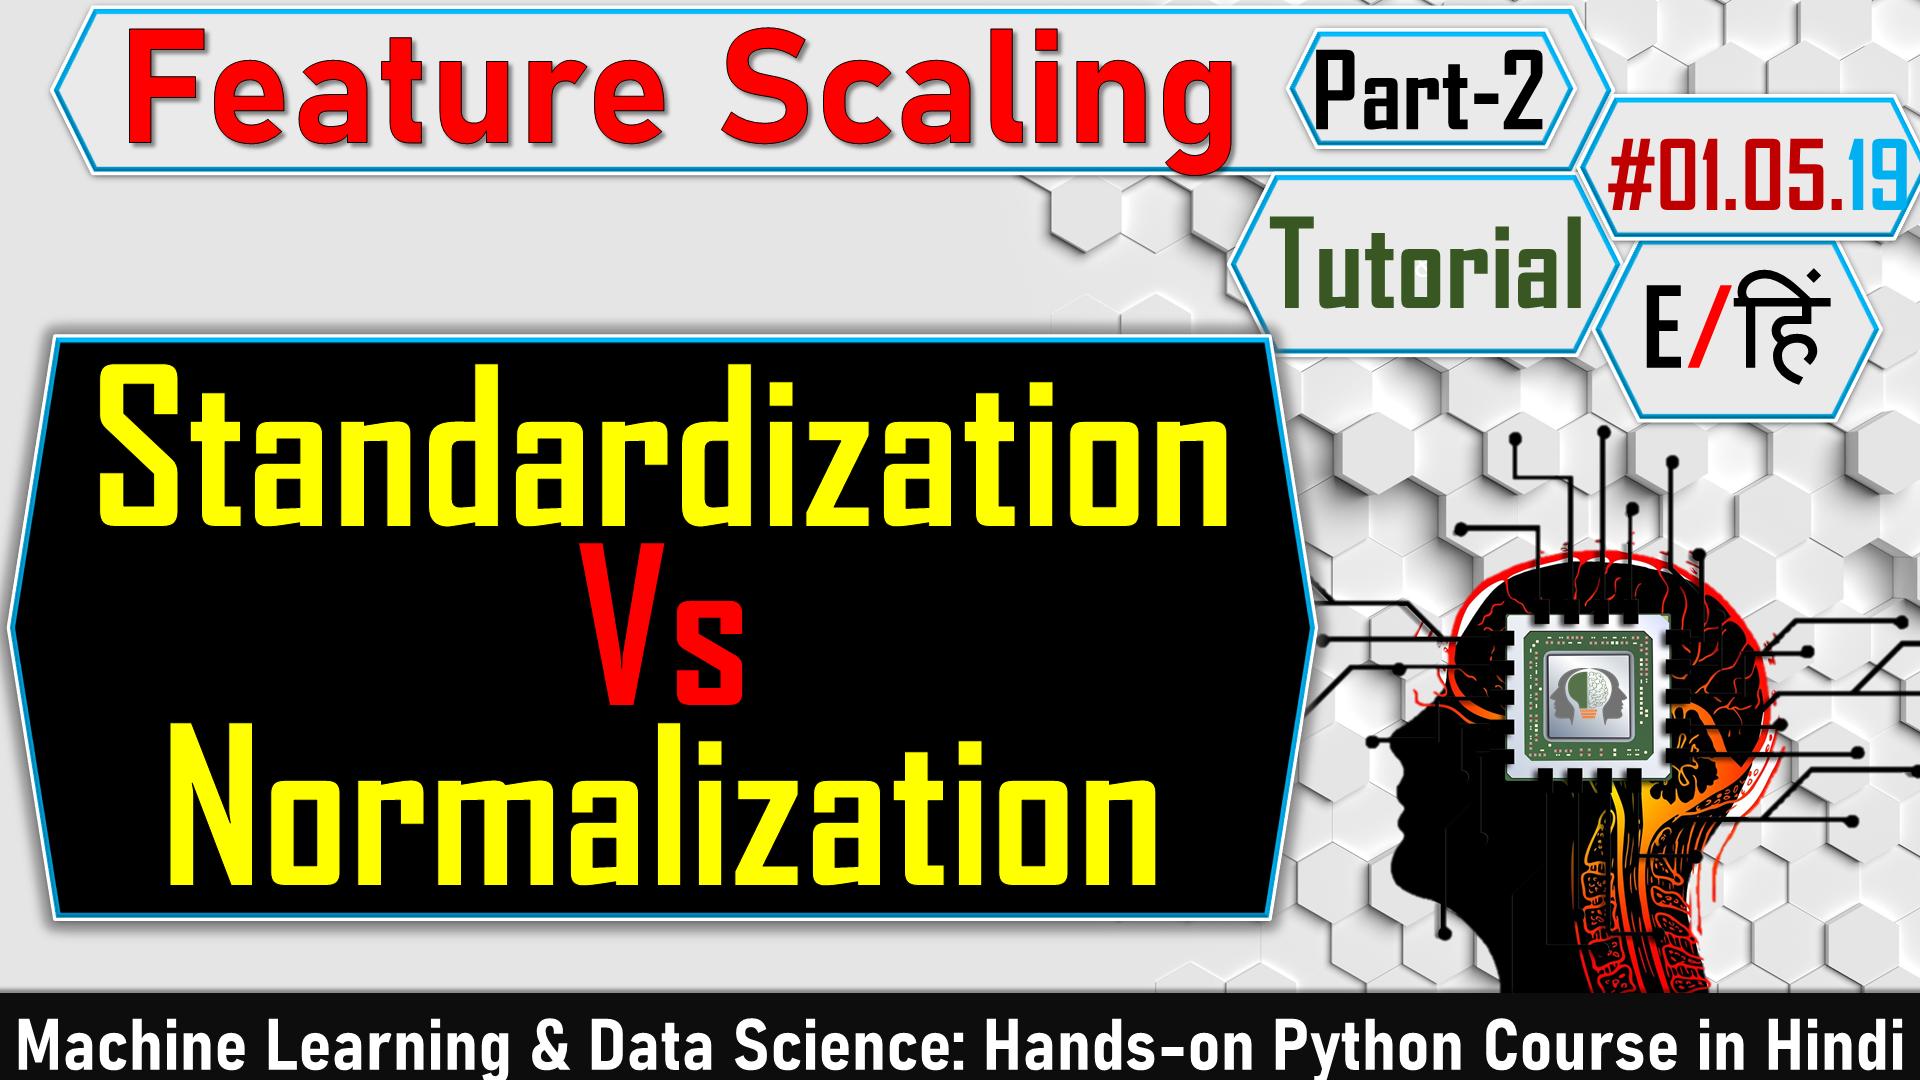 Feature Scaling Standardization and normalization